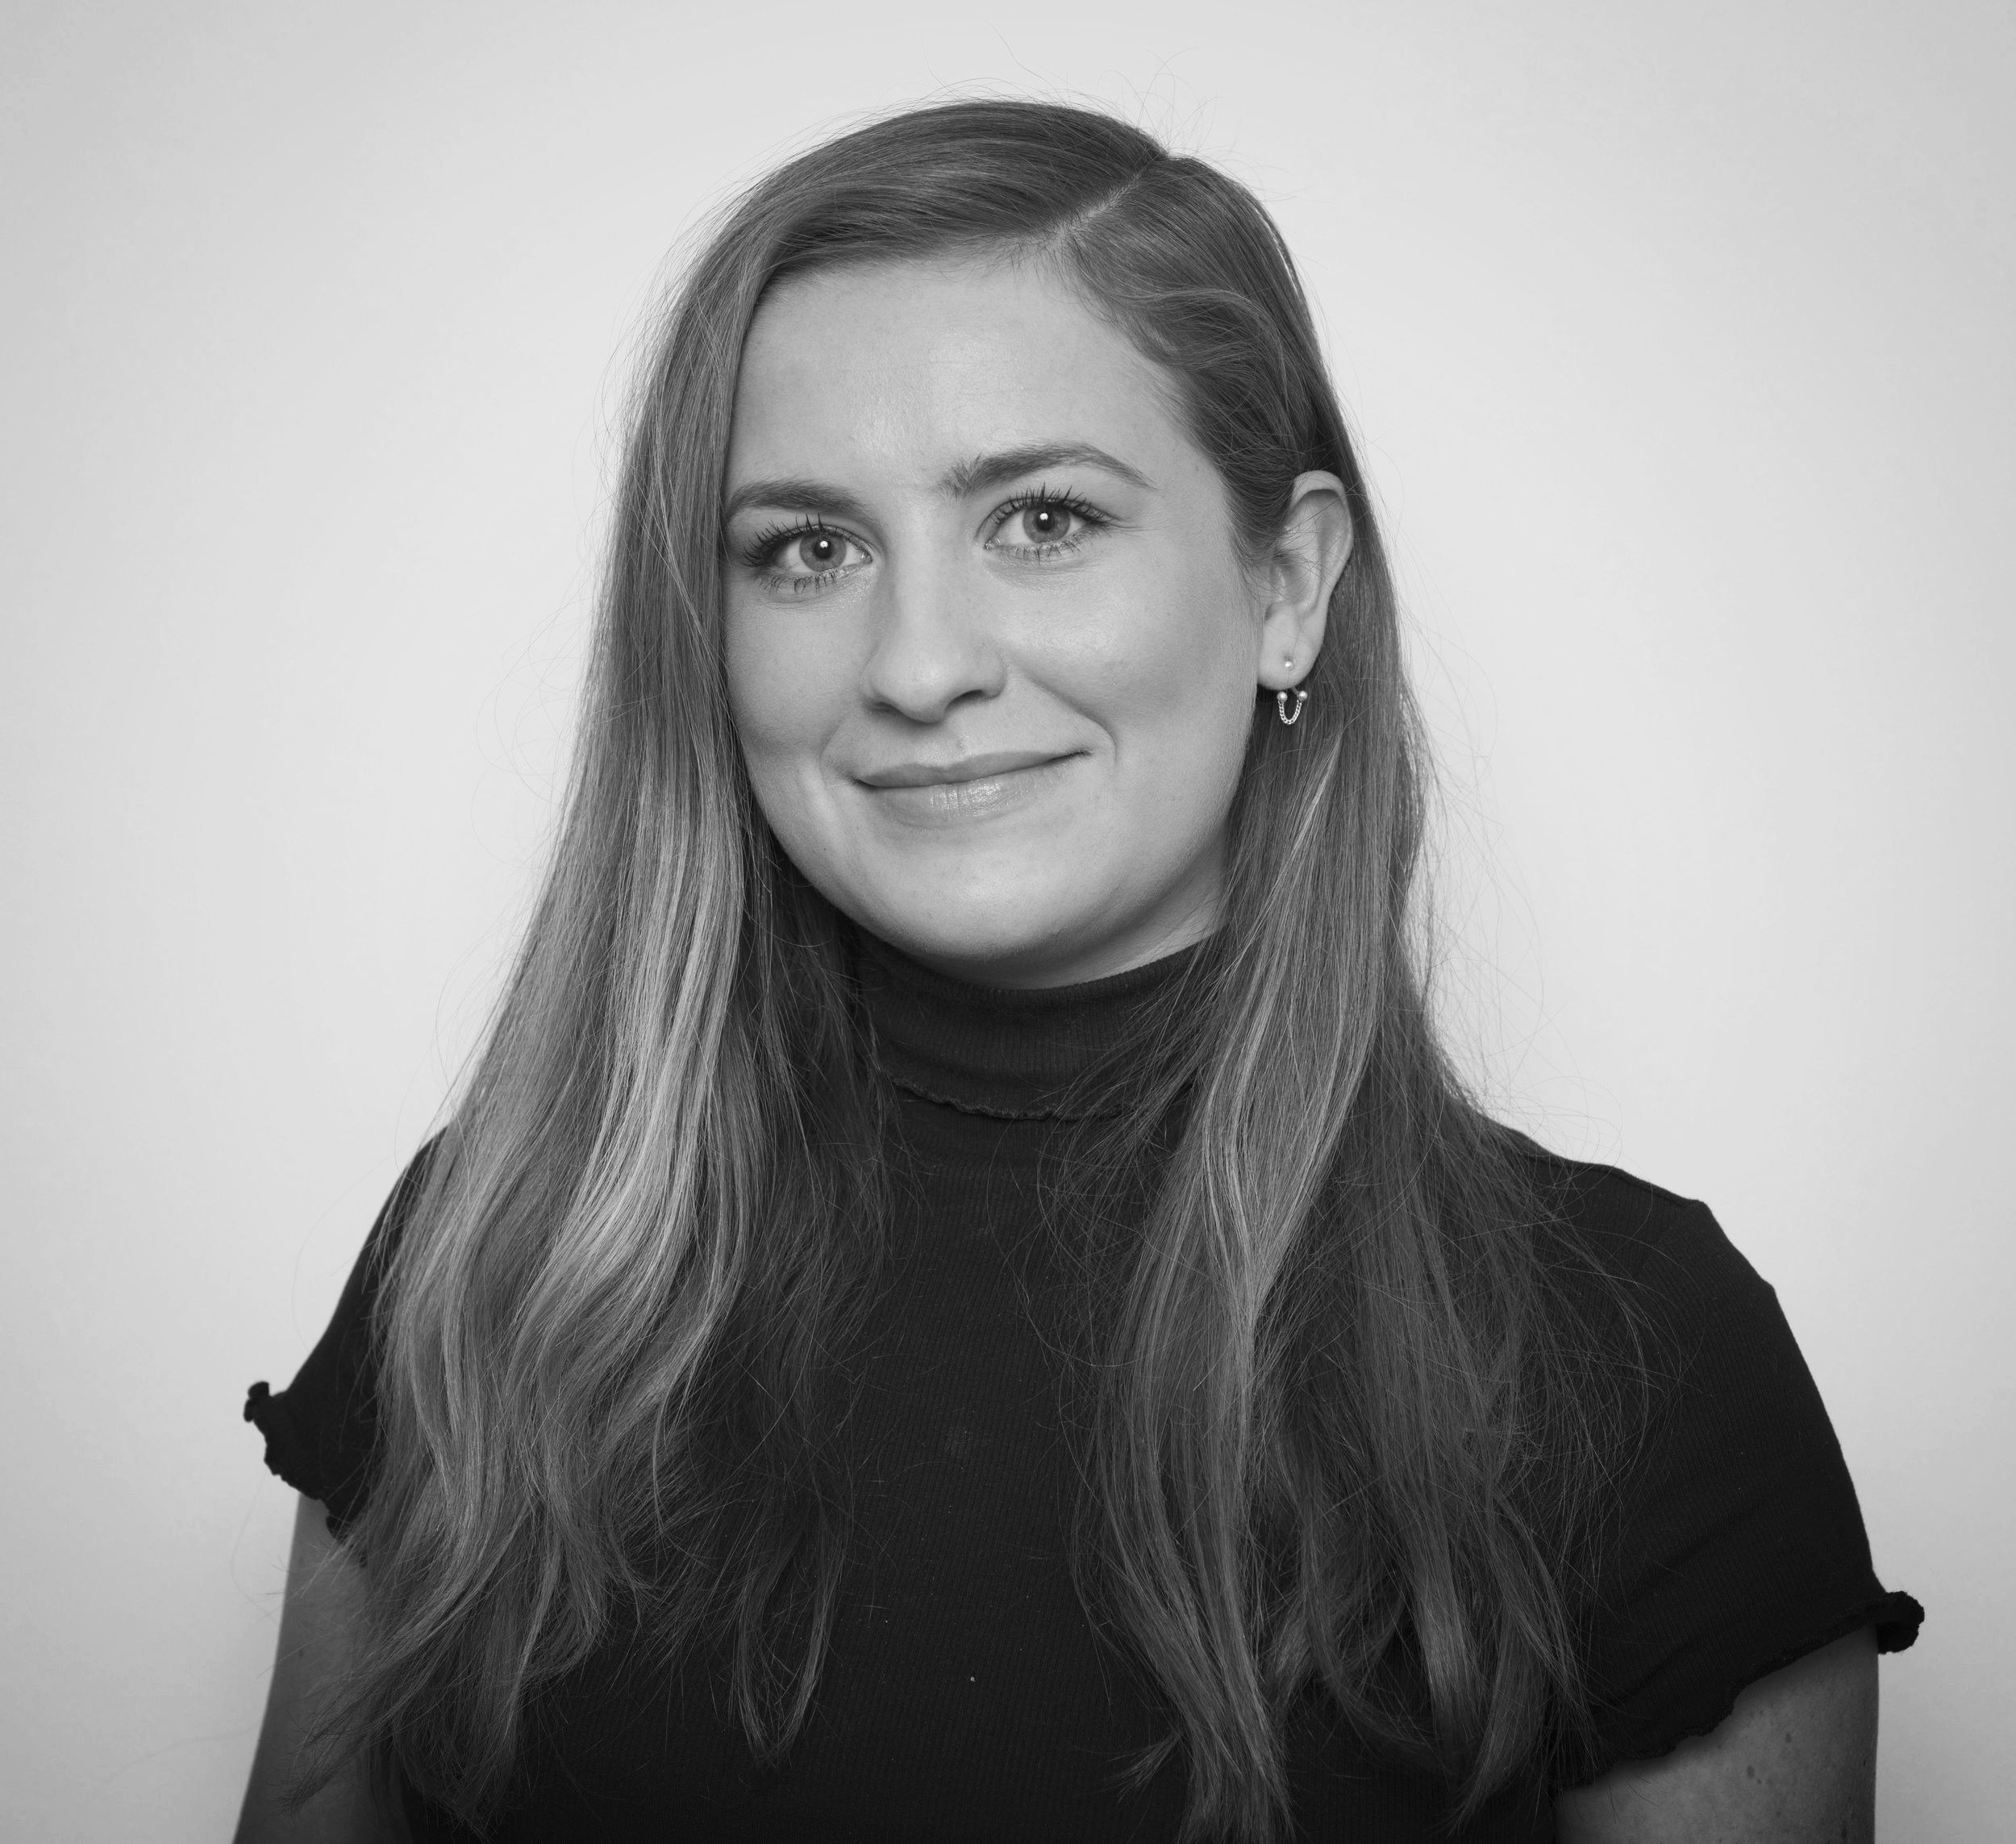 <b>Amanda Wirhed</b><br>Account Executive, Lifestyle